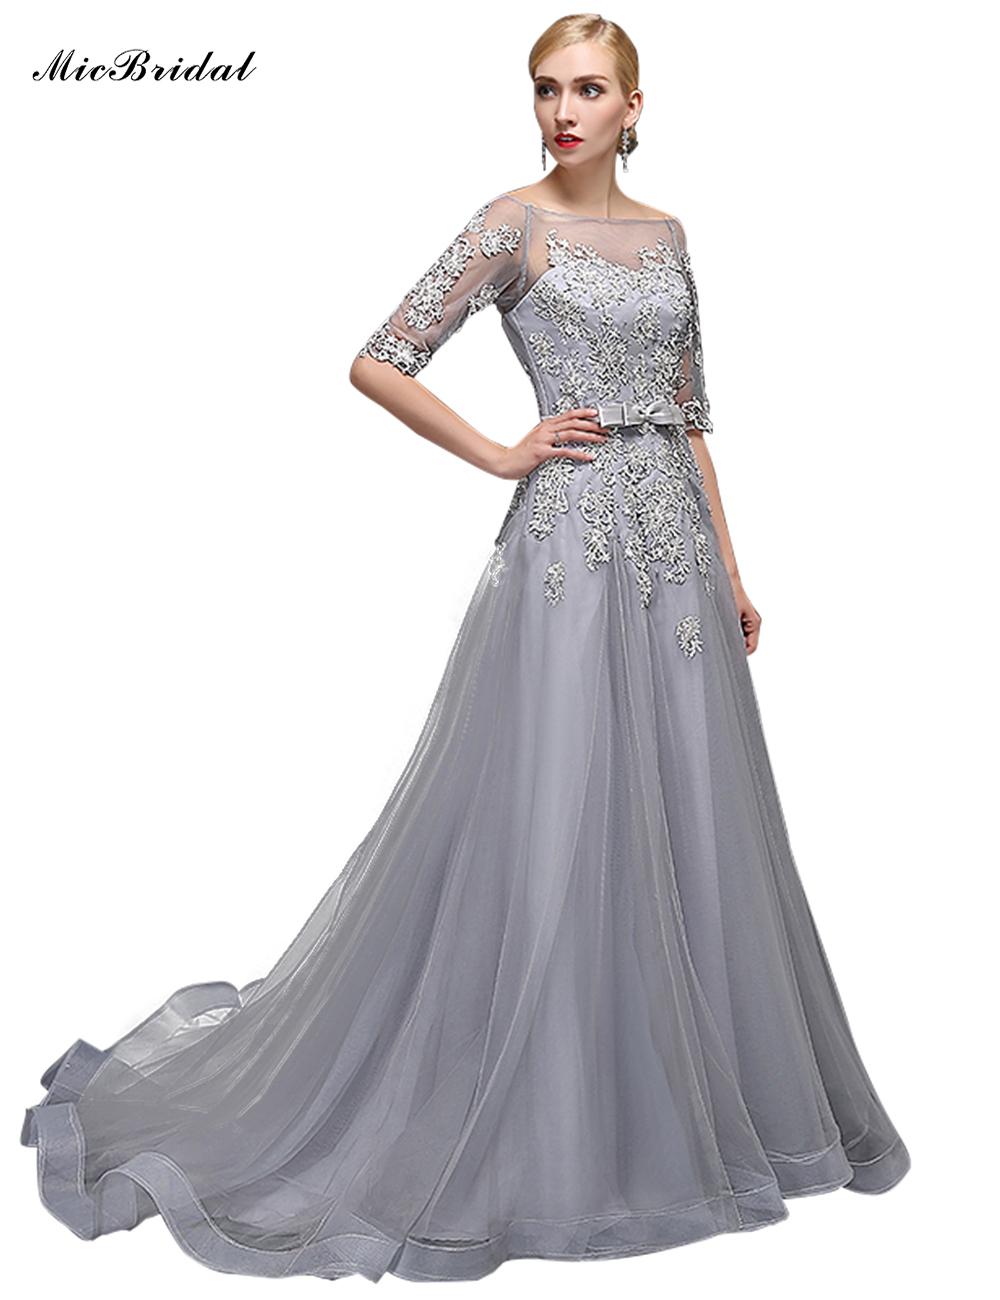 Micbridal custom made half sleeve long elegant prom for Formal wedding dresses for mother of the bride